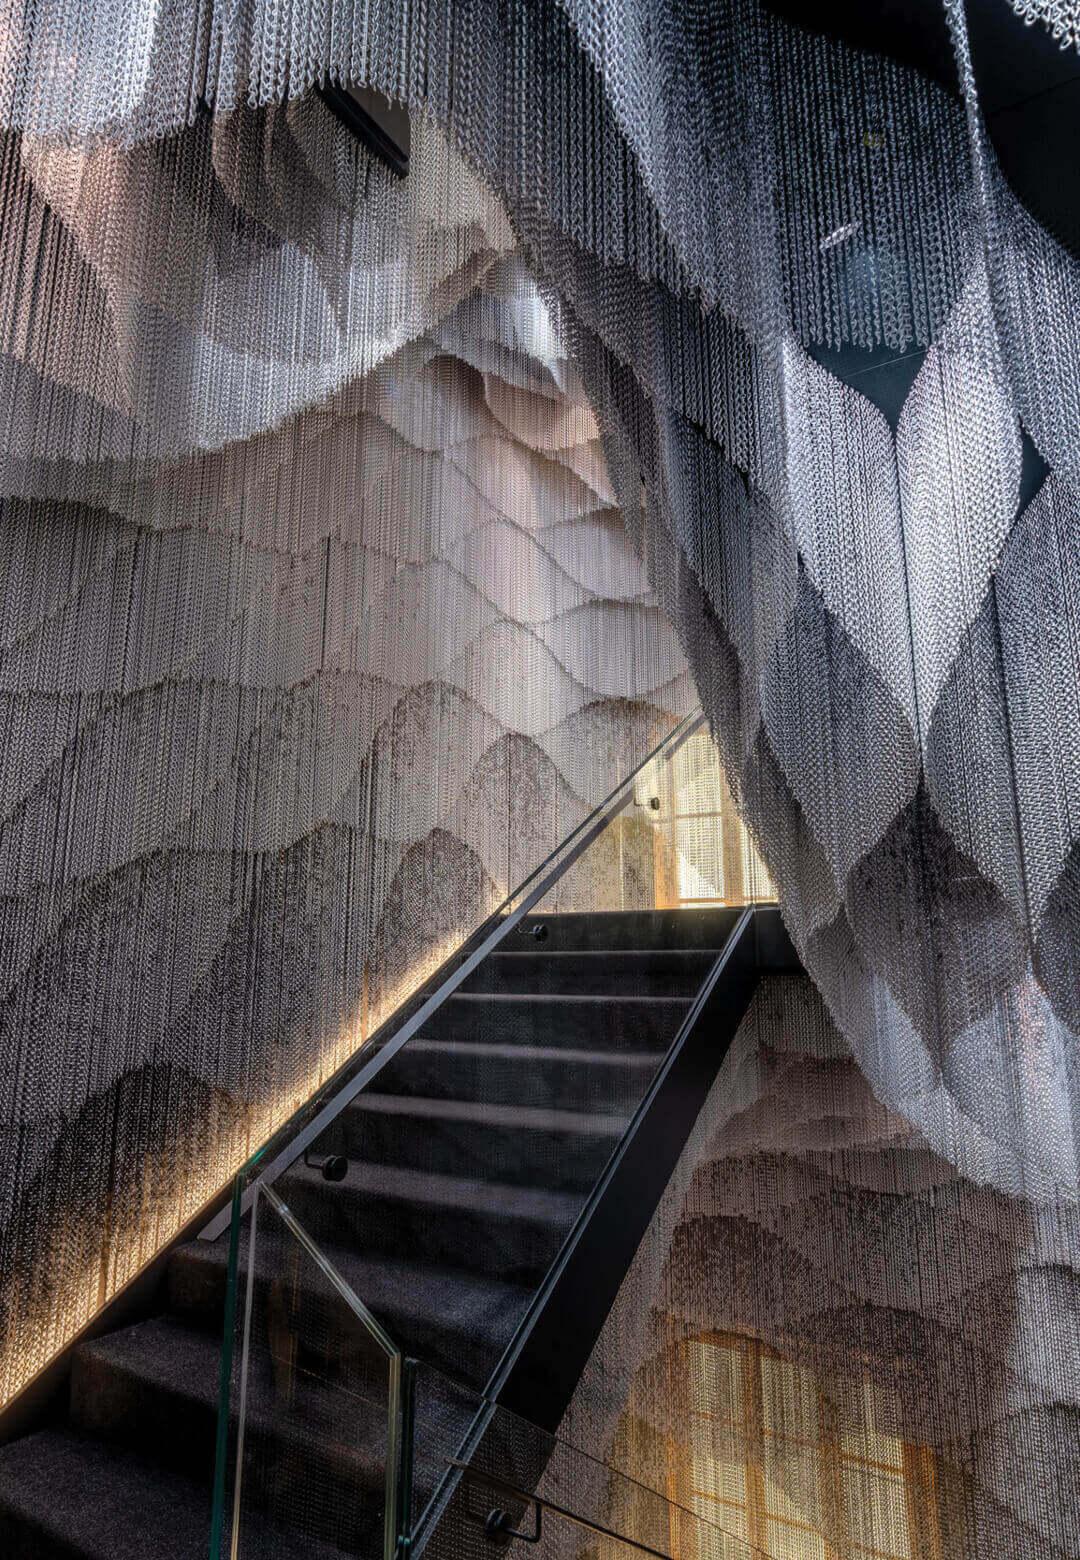 Kengo Kuma and Associates has draped a staircase of Antoni Gaudí's Casa Batlló in an aluminium link curtain | Casa Batlló Staircase by Kengo Kuma | STIRworld